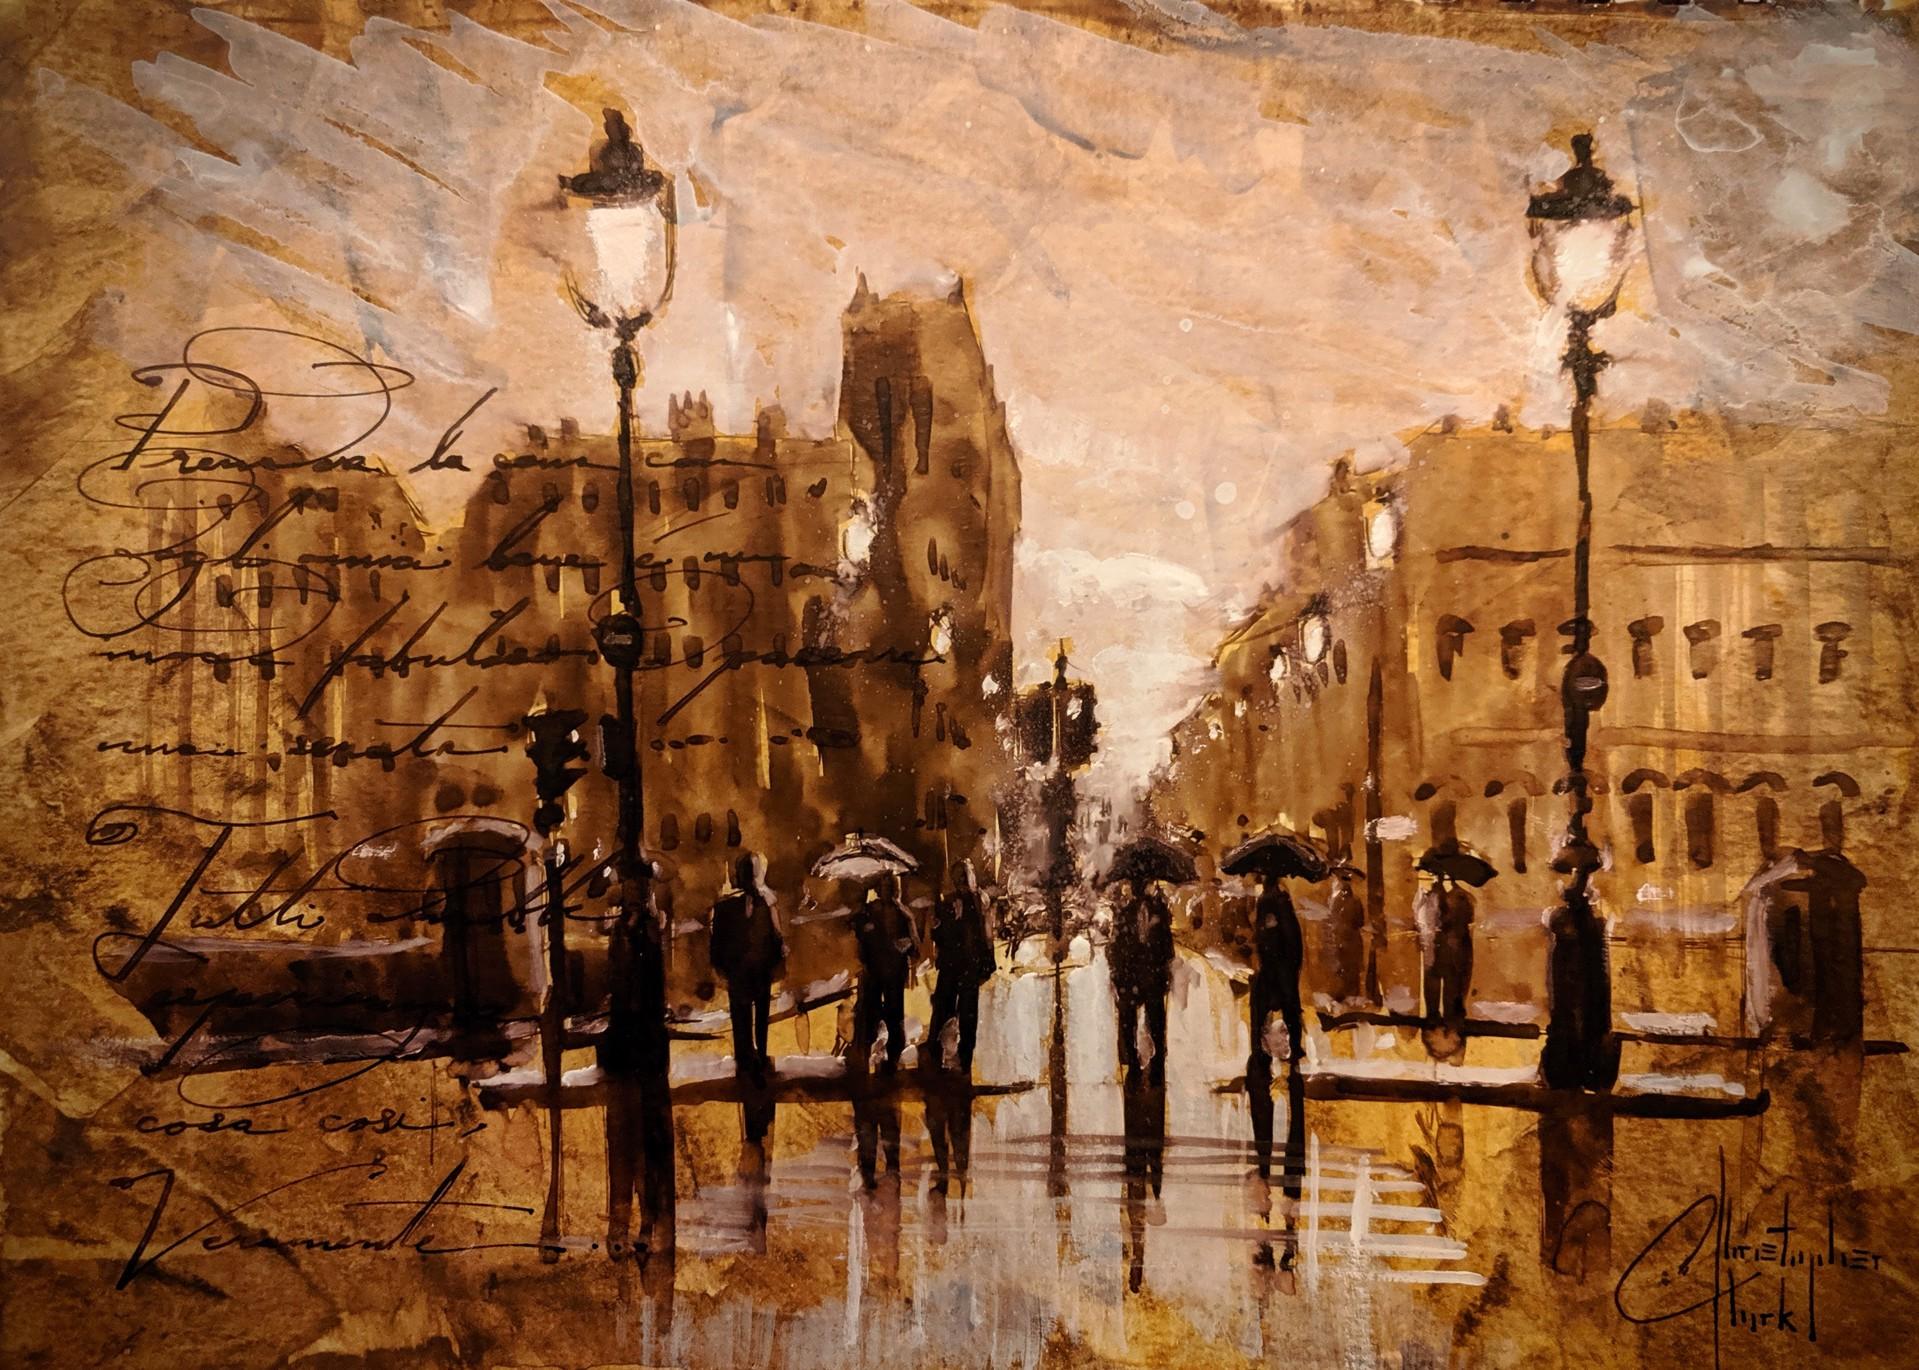 Sepia Tone, Paris IV by Christopher Clark